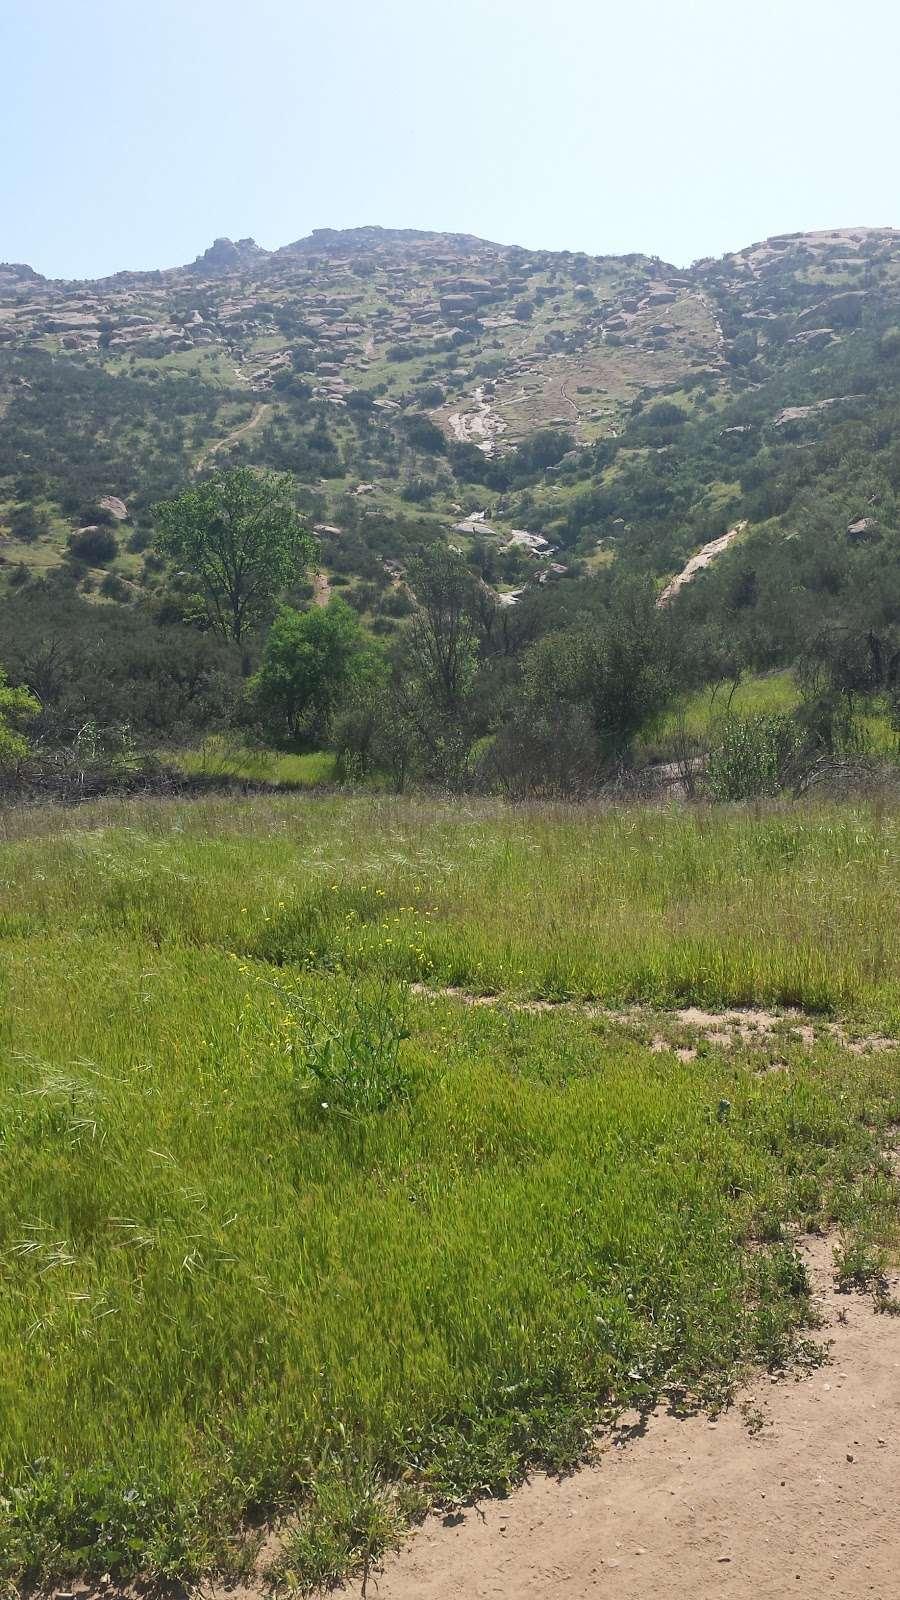 Hummingbird Trail - park  | Photo 2 of 10 | Address: 2954-2980 Kuehner Dr, Simi Valley, CA 93063, USA